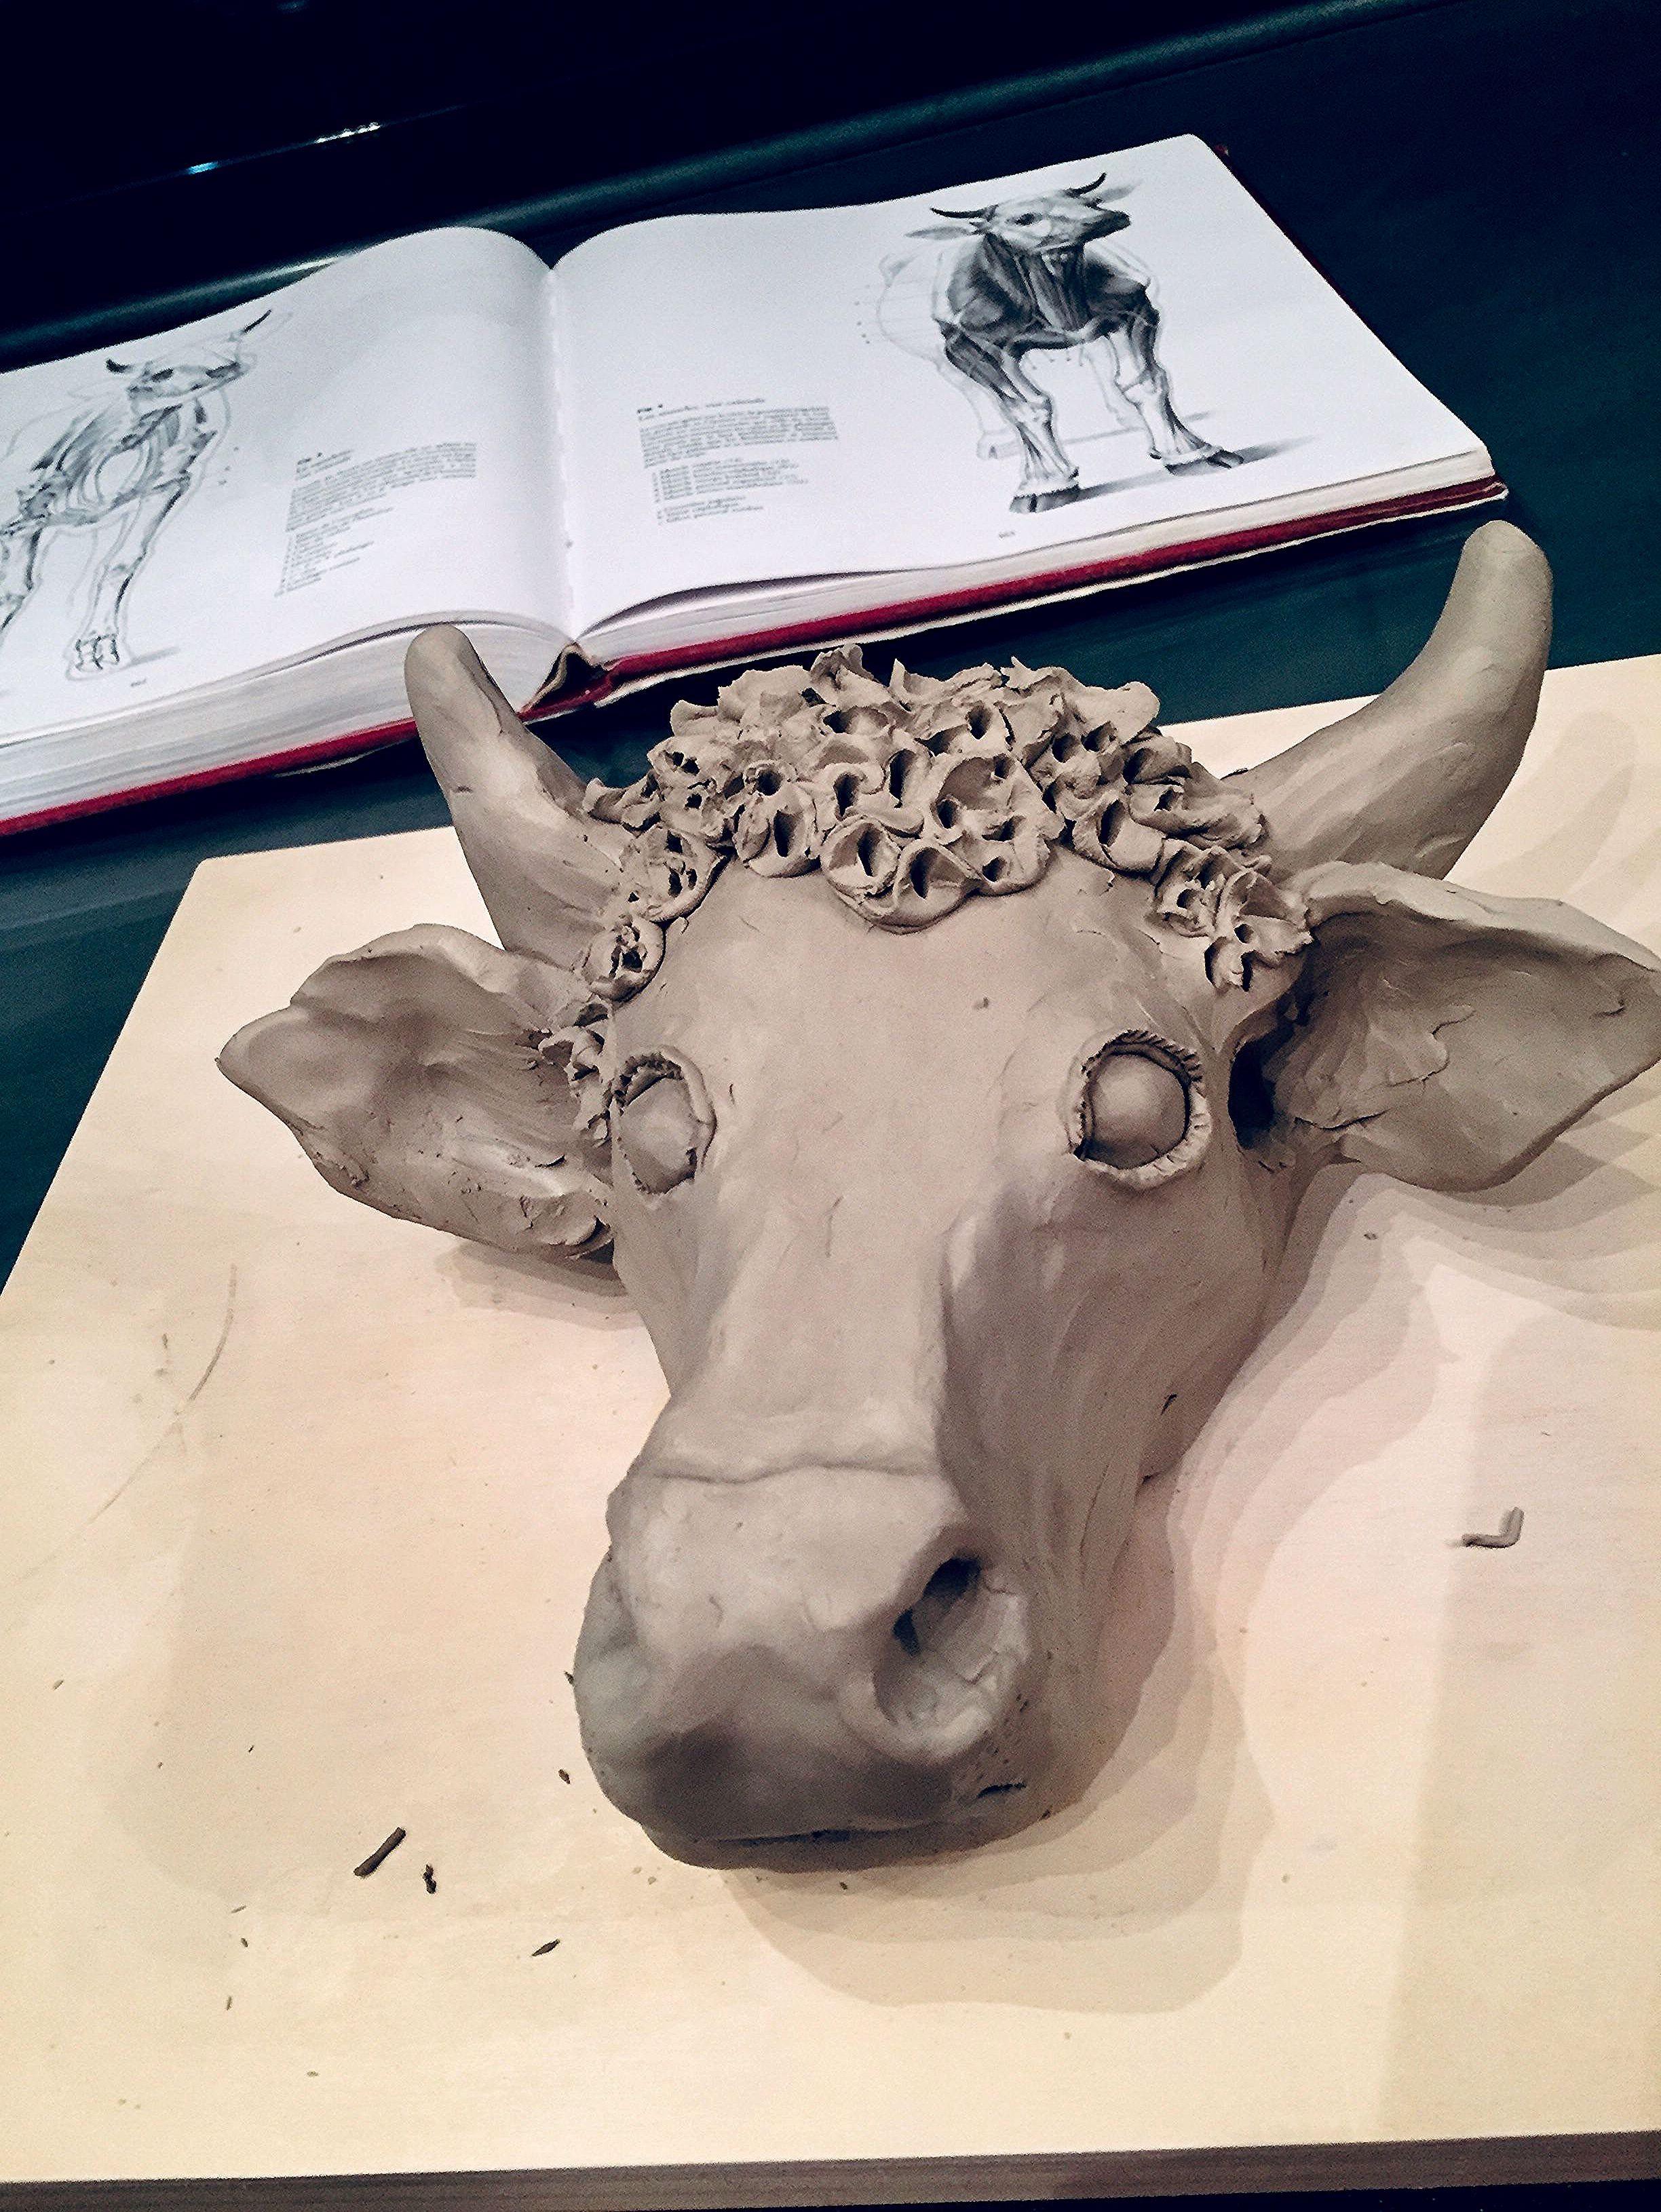 Miss Marguerite # VVepreuve 2019 in 2020   Pottery animals